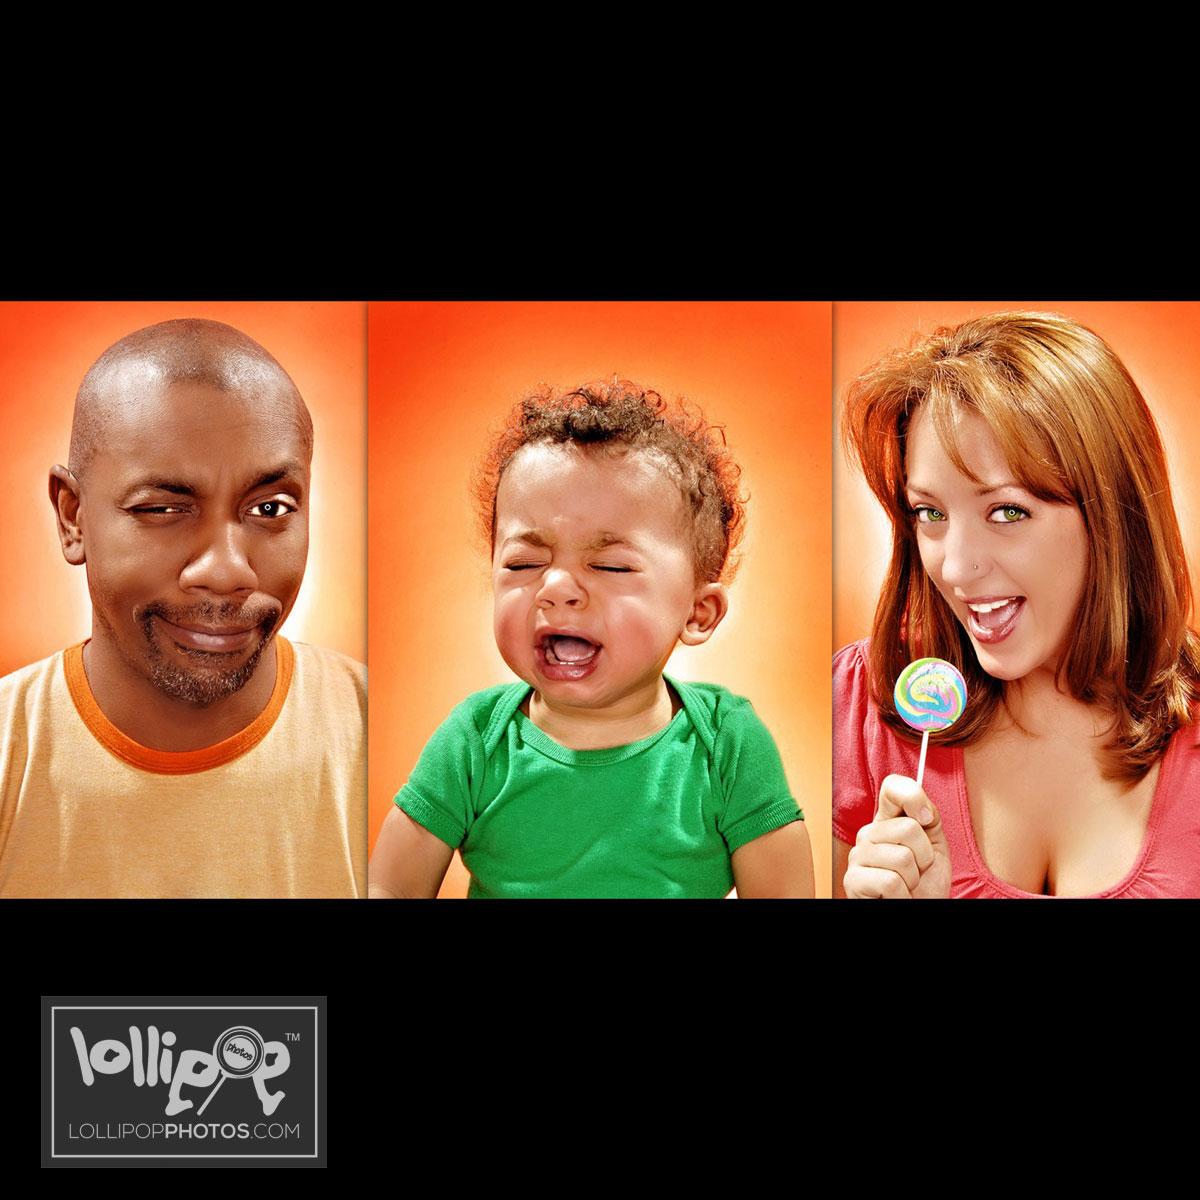 msdig-nora-canfield-lollipop-photos-533.jpg